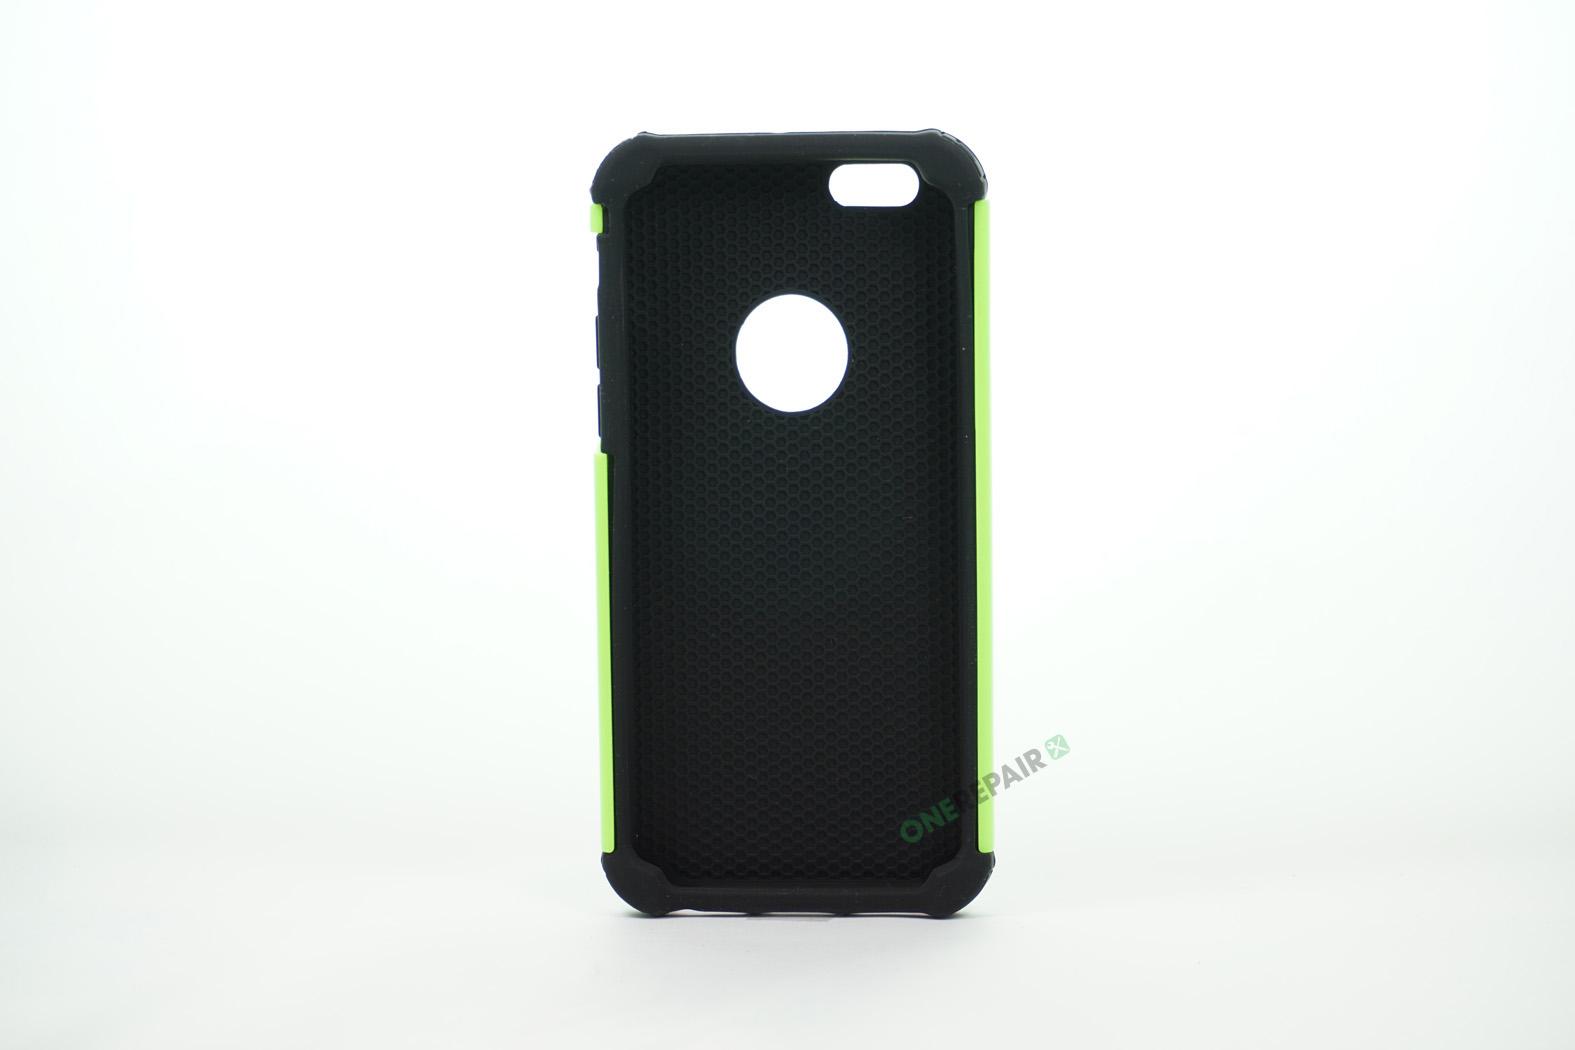 350531_iPhone_6_6S_Haandvaerkercover_Hardcase_Cover_Groen_OneRepair_00003